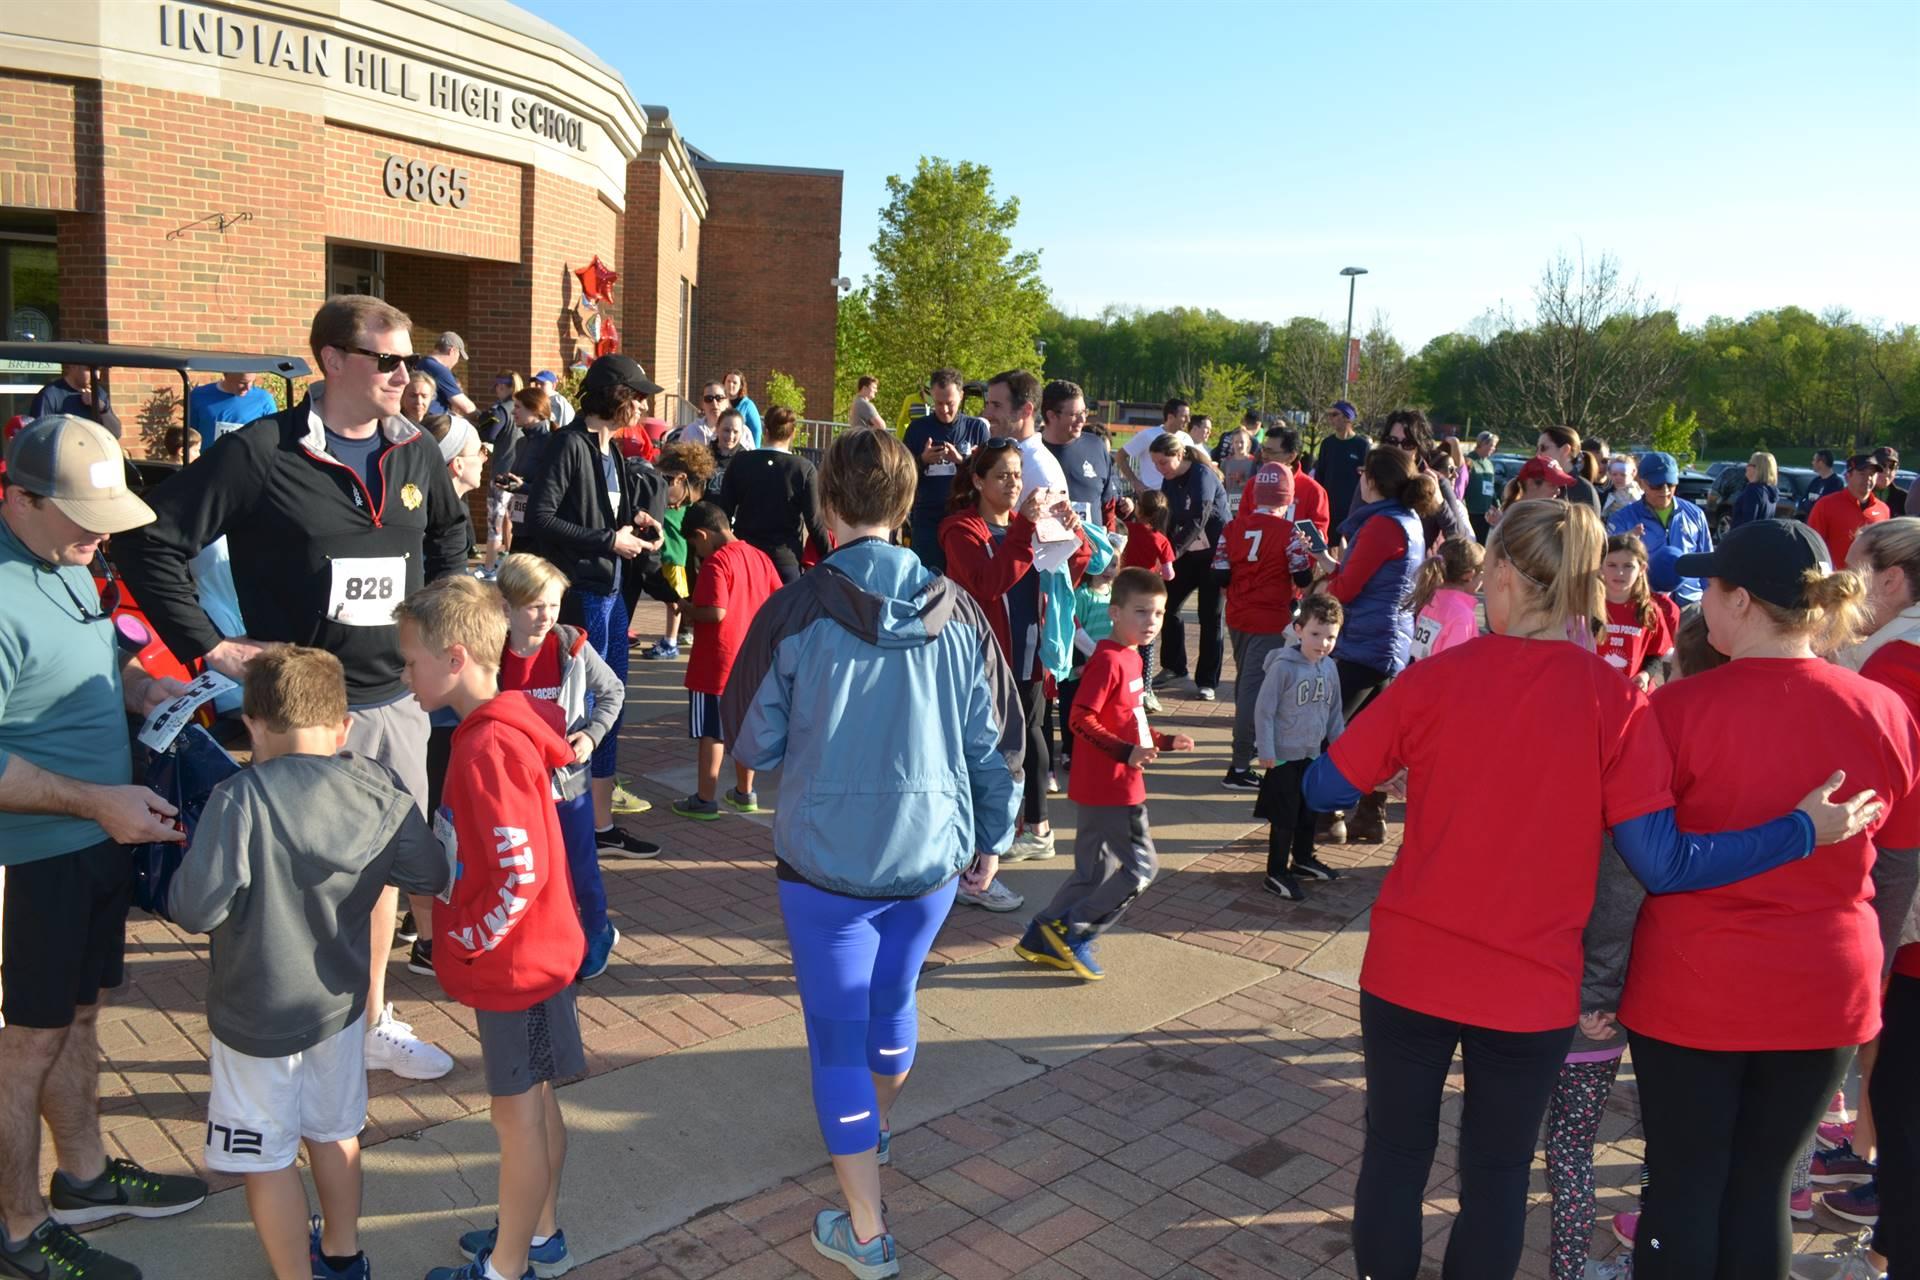 Crowd pre-race